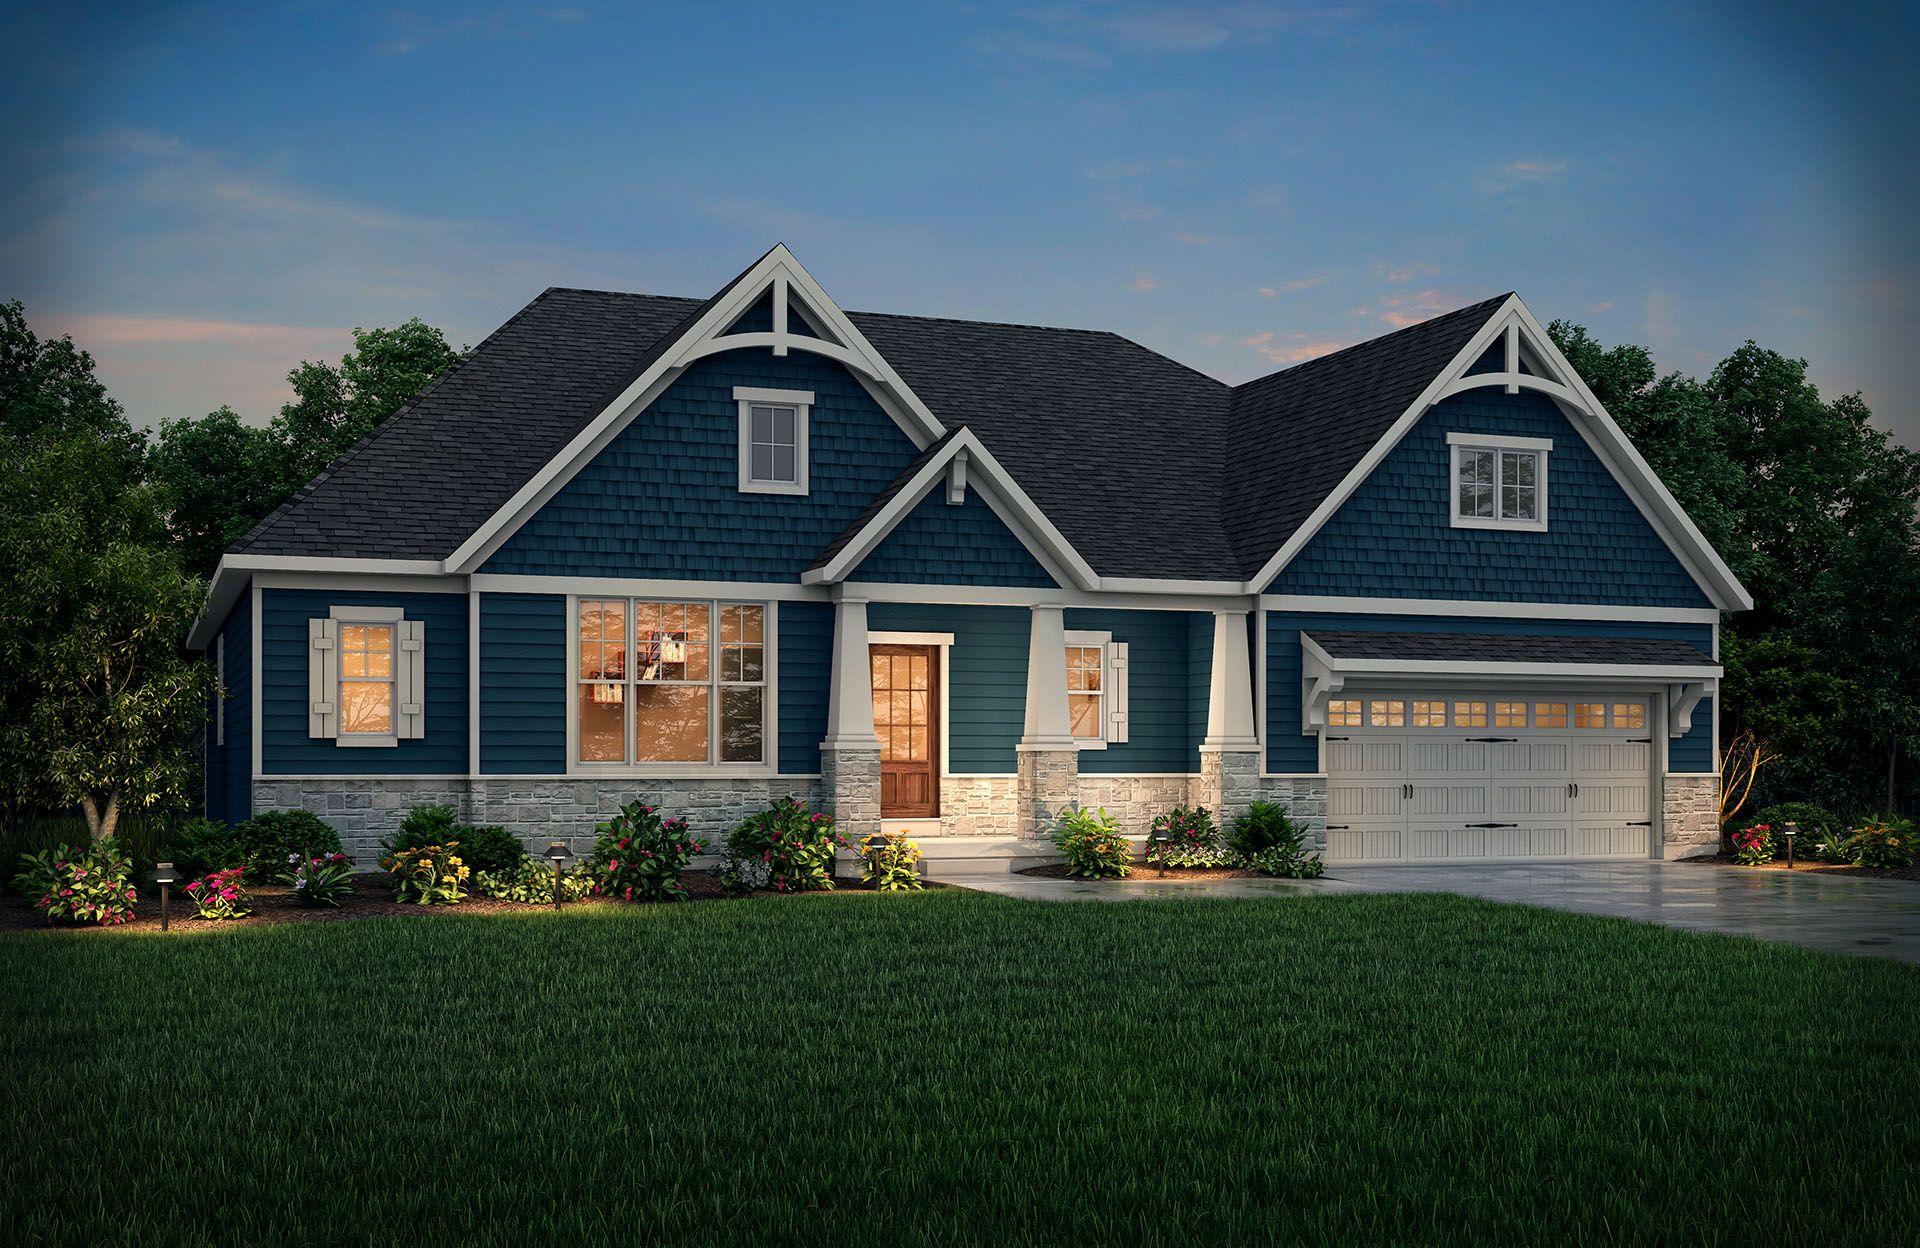 Single Family for Active at Oak Ridge At Tipton Lakes - Lyndhurst 4950 Carr Hill Road Columbus, Indiana 47201 United States